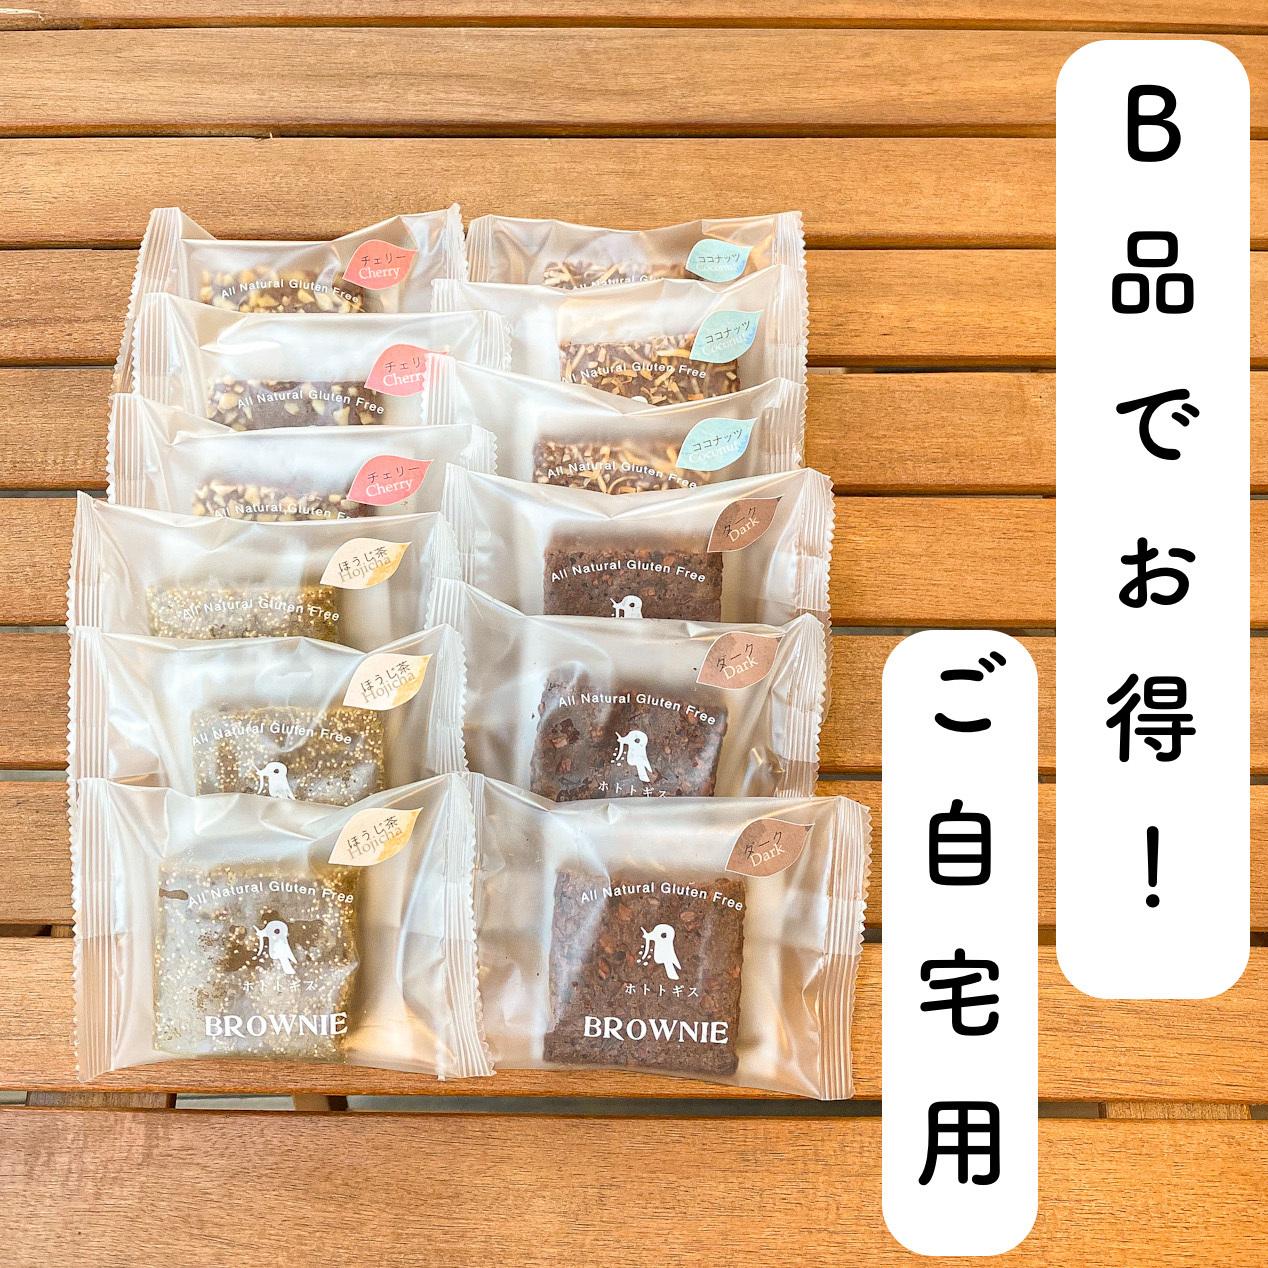 【B品箱買い(ご自宅用)・12個入】米粉のブラウニー